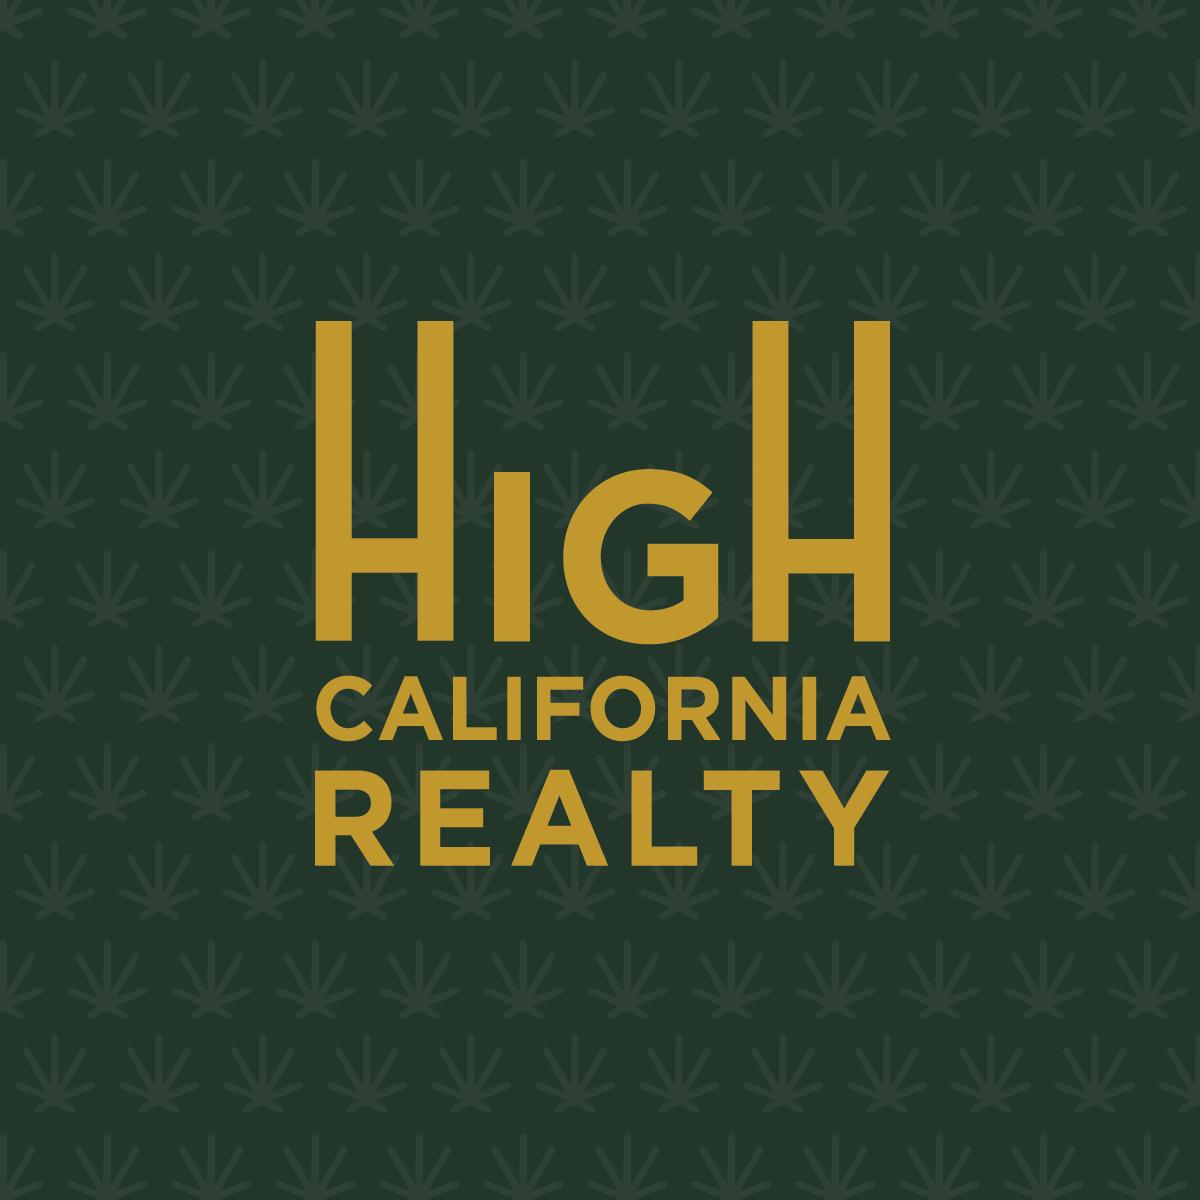 Logo for High California Realty, Inc.